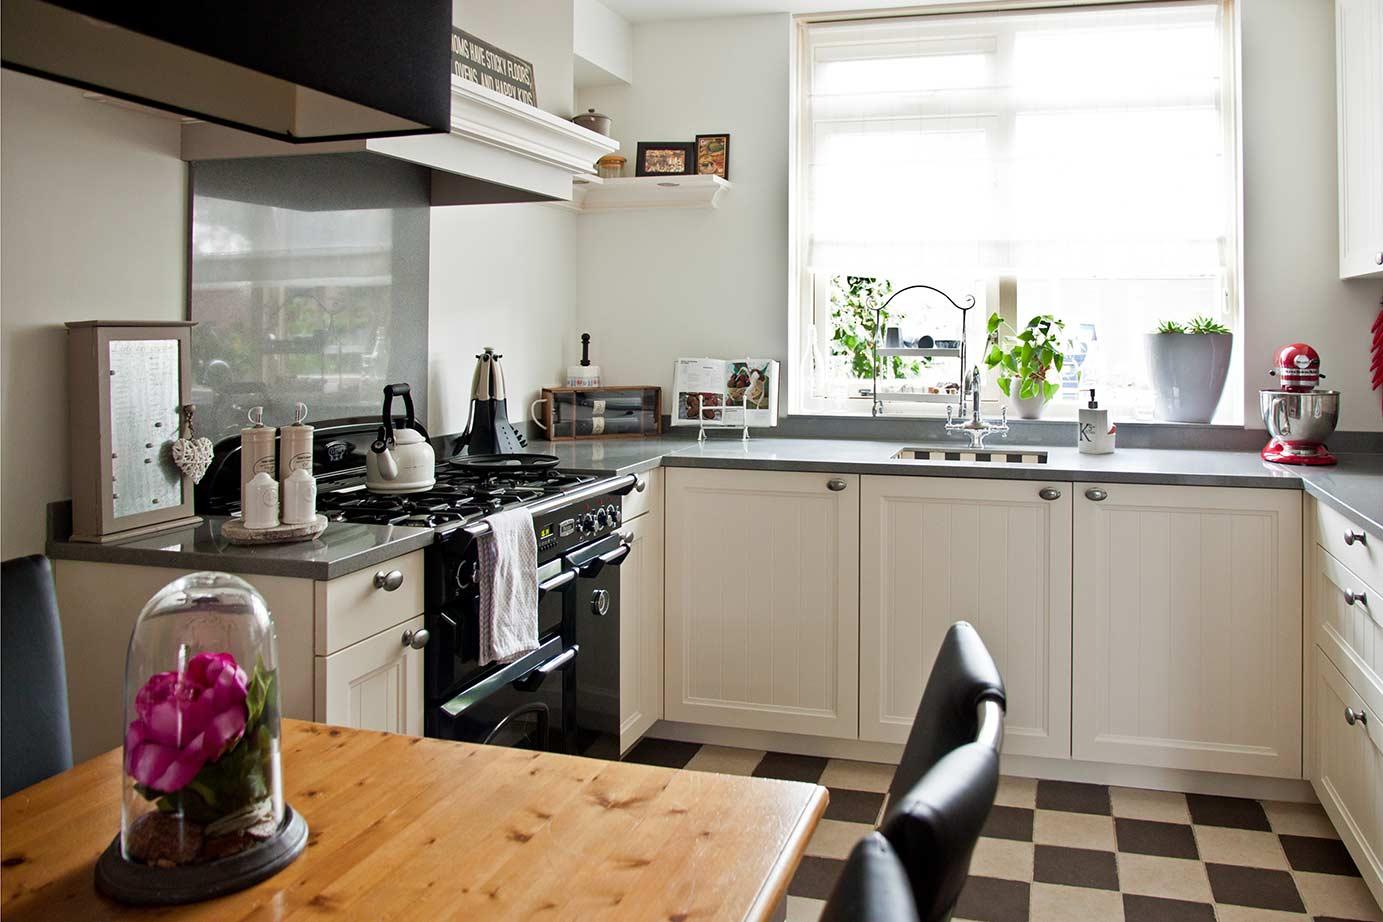 Avanti Keukens Kesteren : Avanti keukens in kesteren betuwe klanten geven ons een